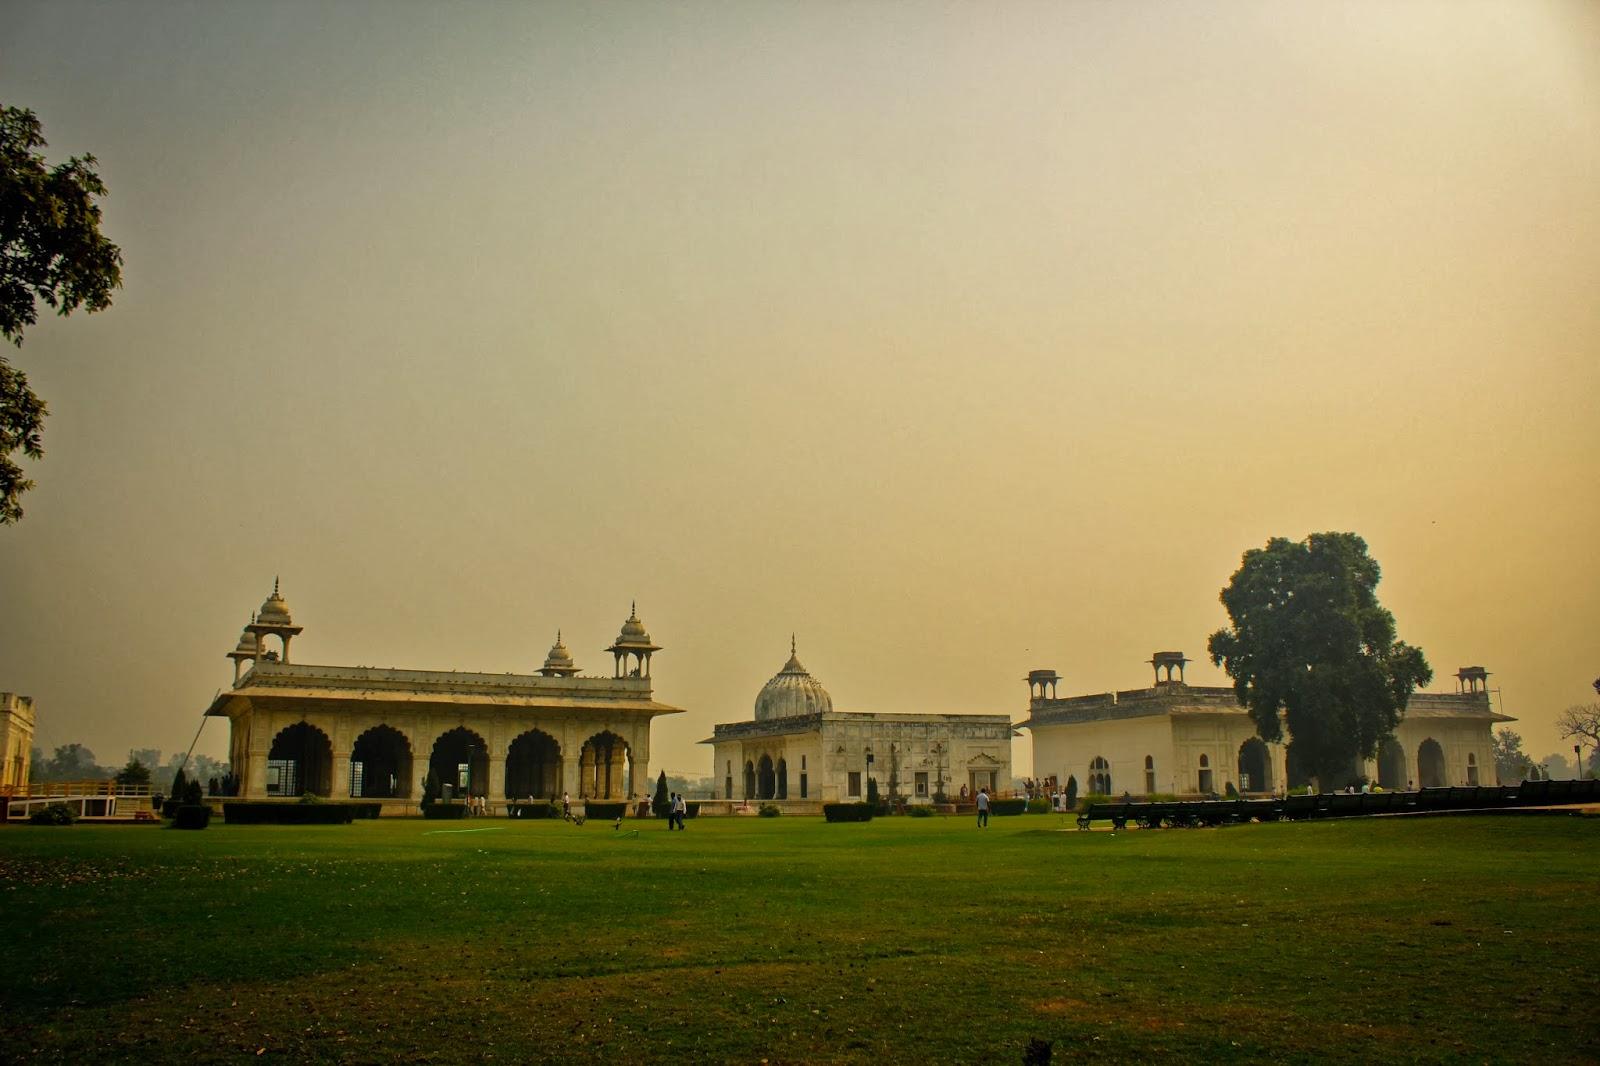 (from left to right) Diwan-i- Khas, Khas Mahal and Rang Mahal